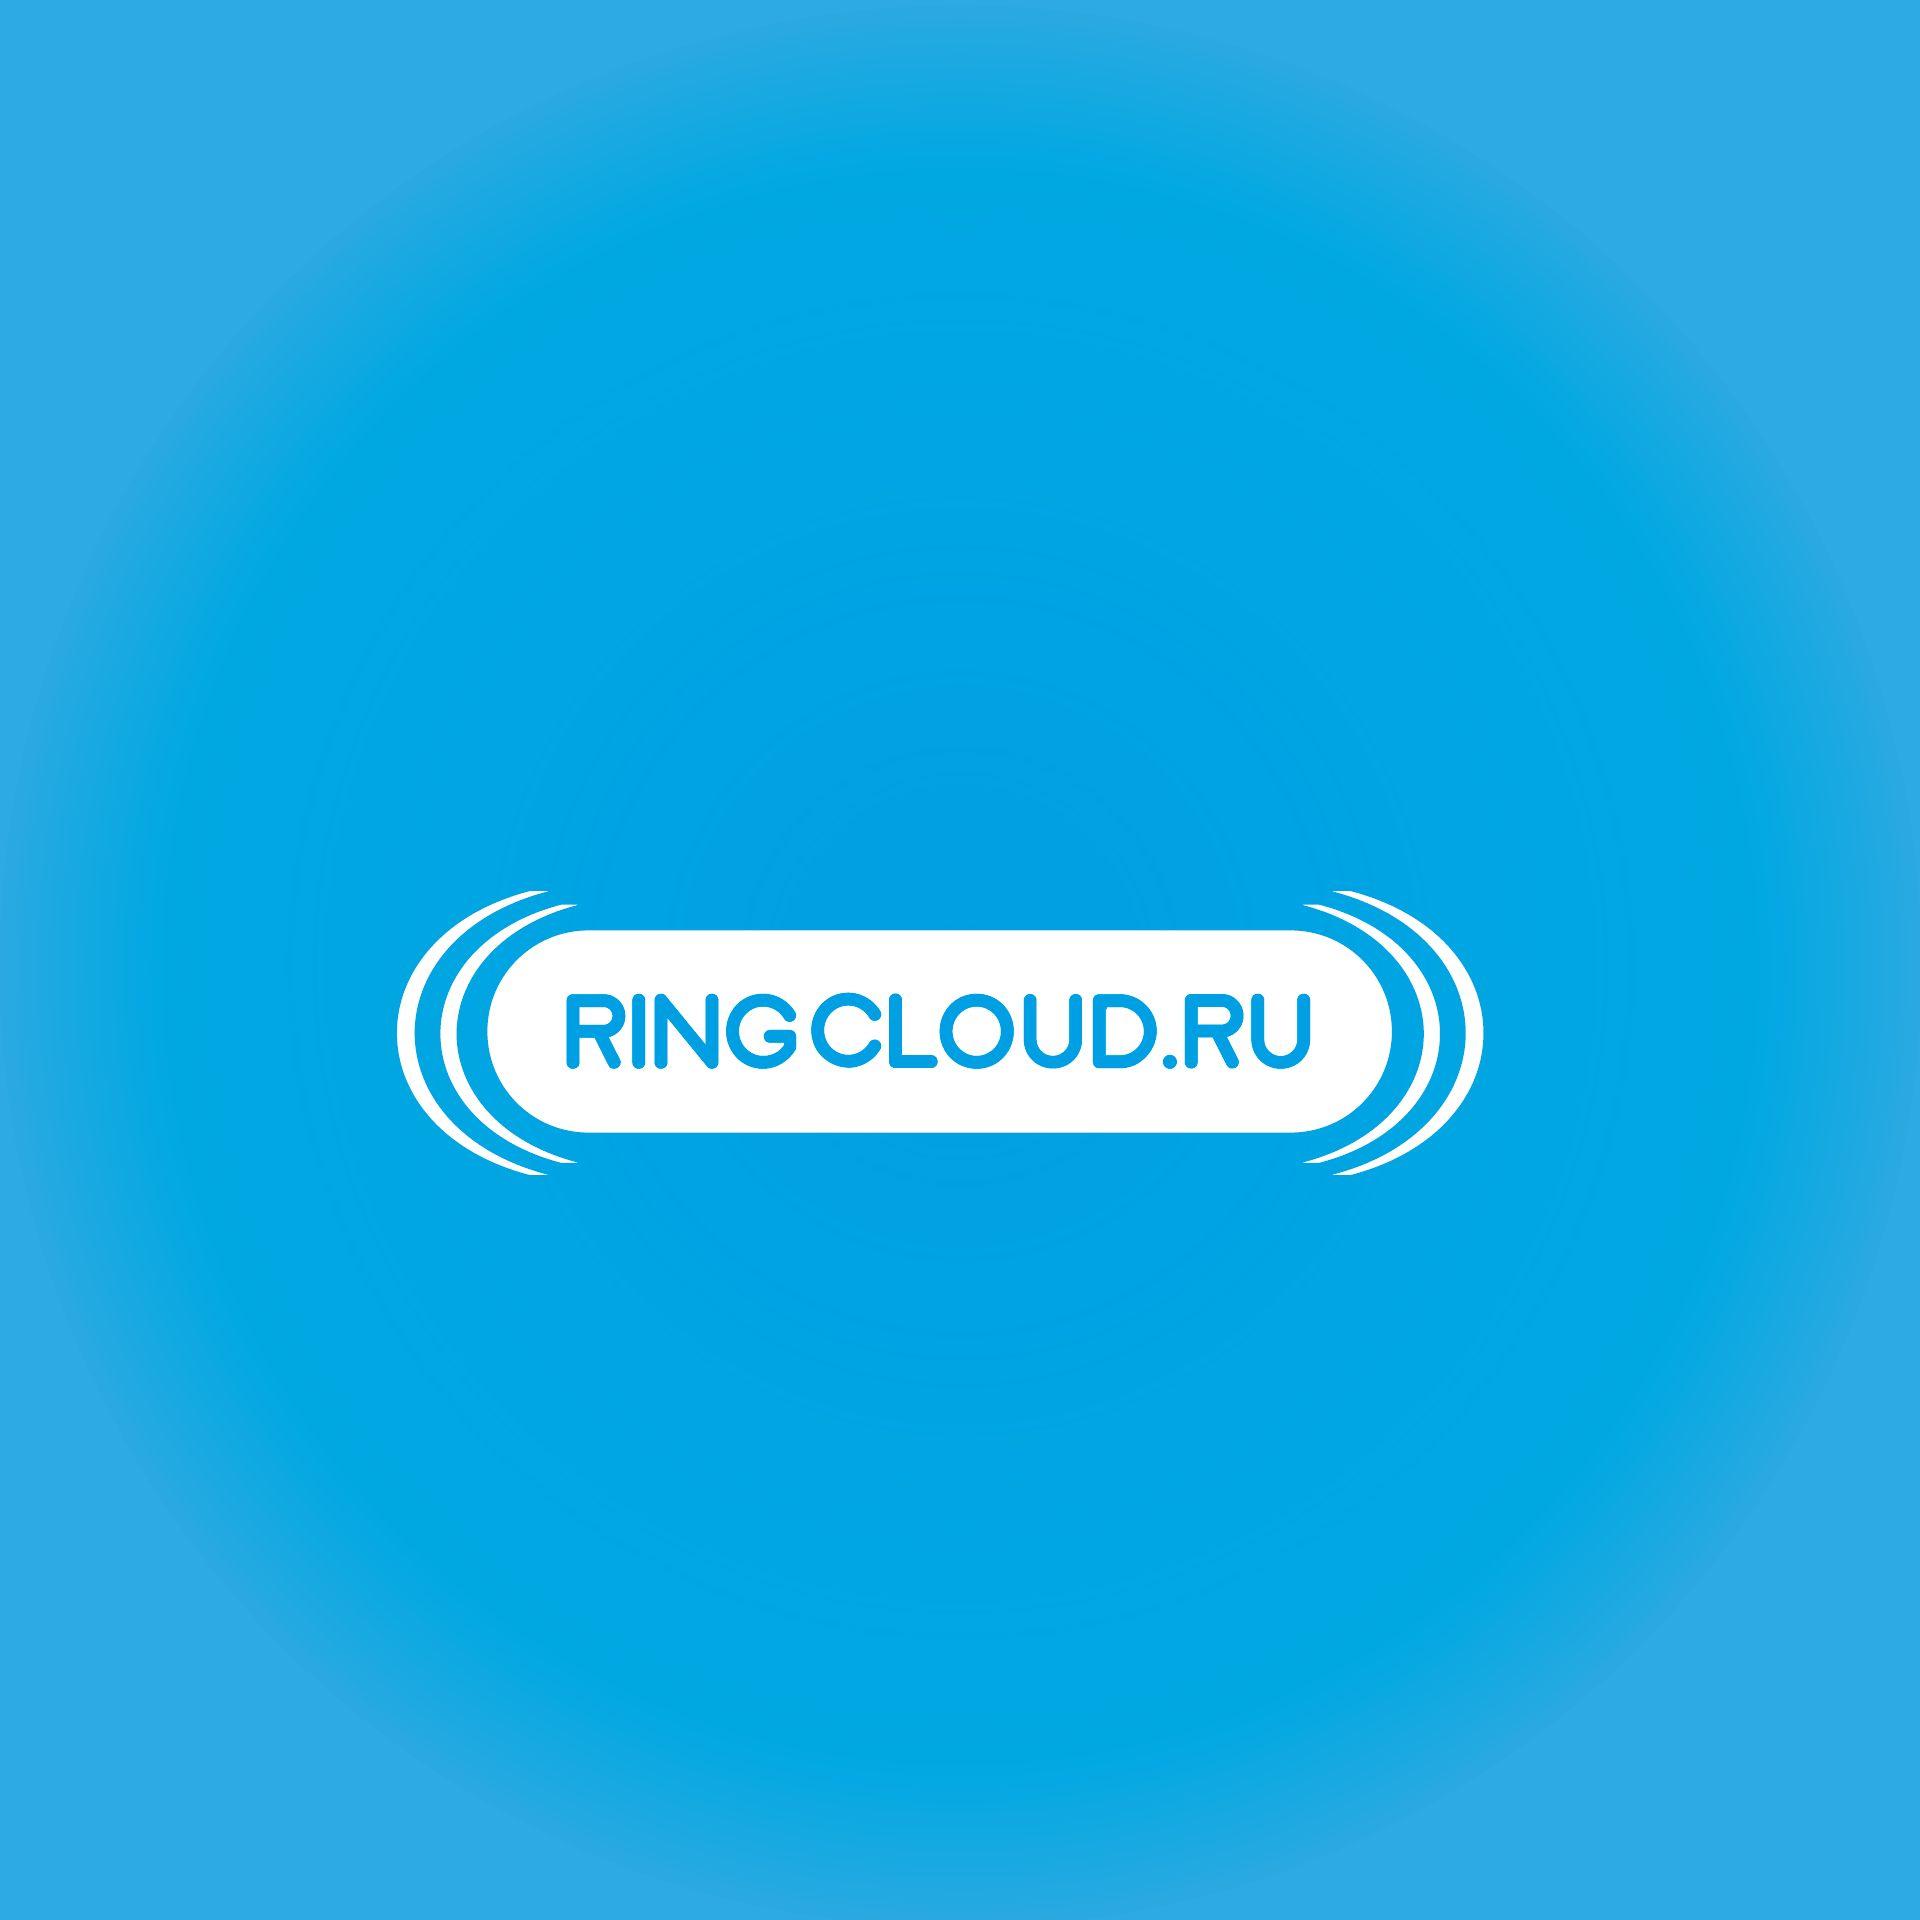 Логотип RingCloud.ru - дизайнер alpine-gold